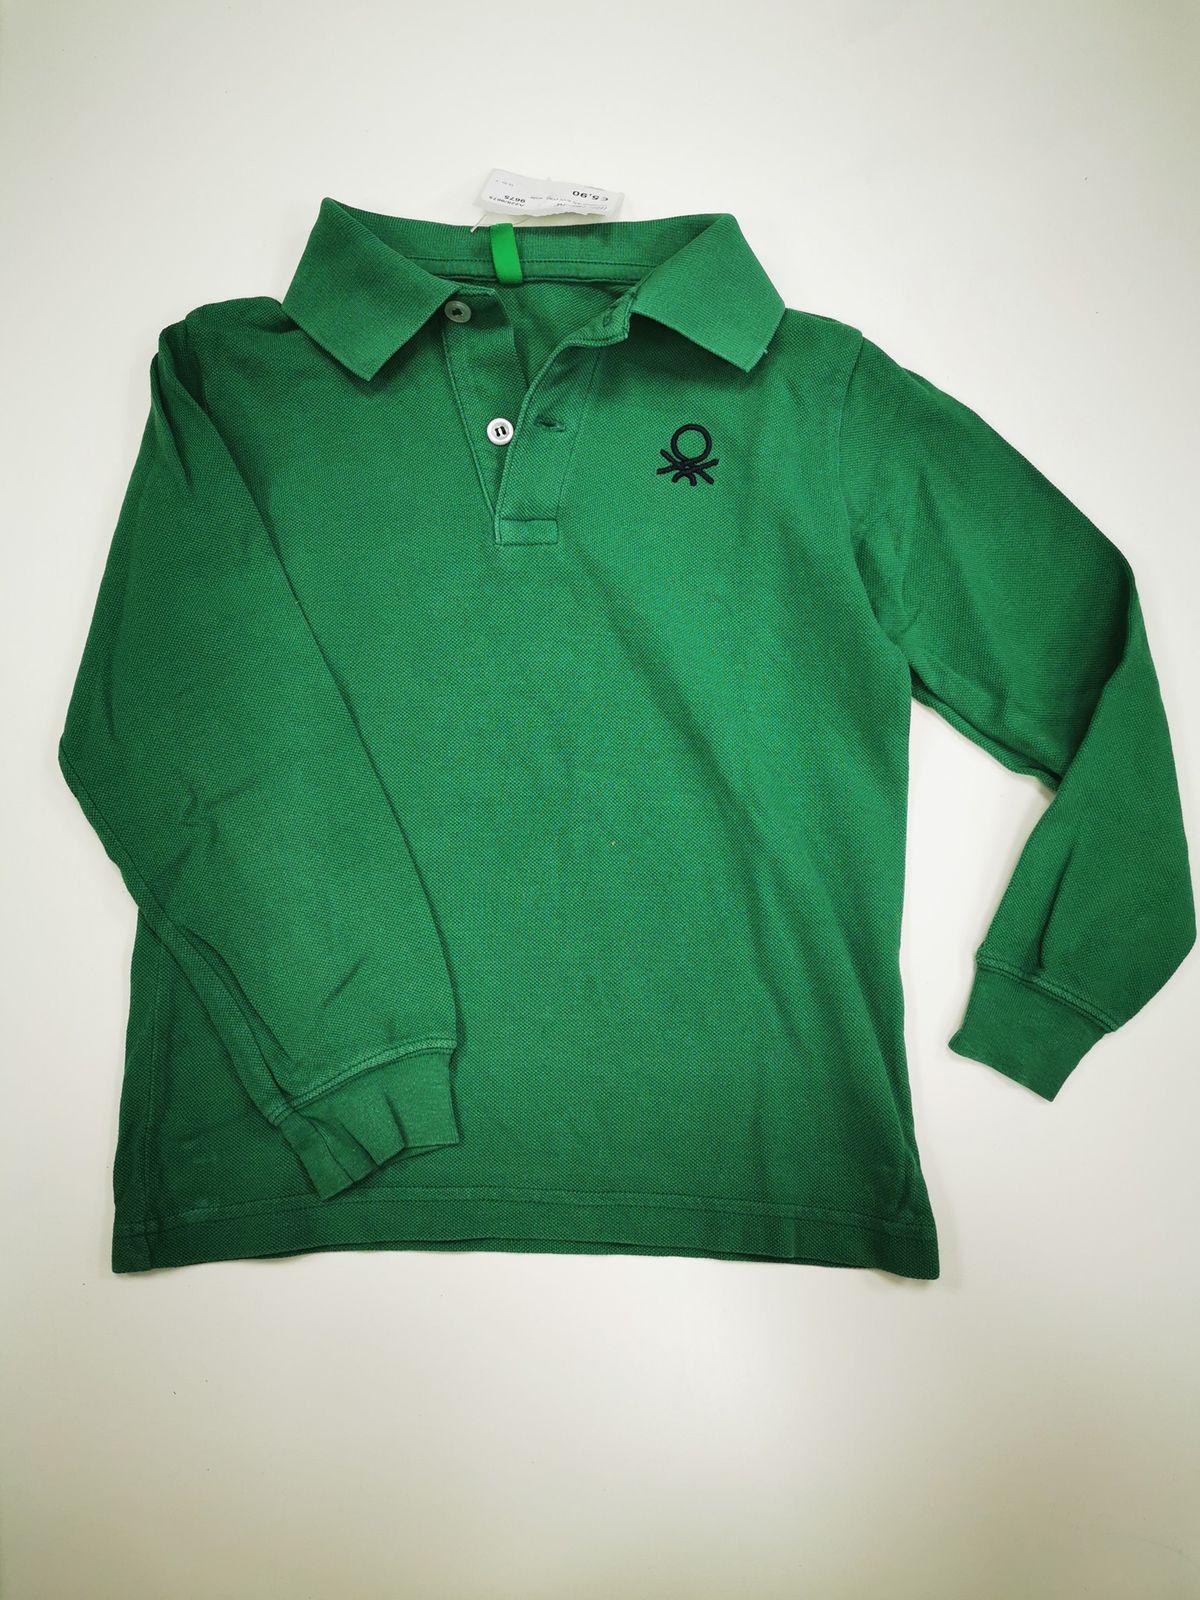 Polo Benetton verde Bimbo  4/5 anni  9675 Euro 5,90